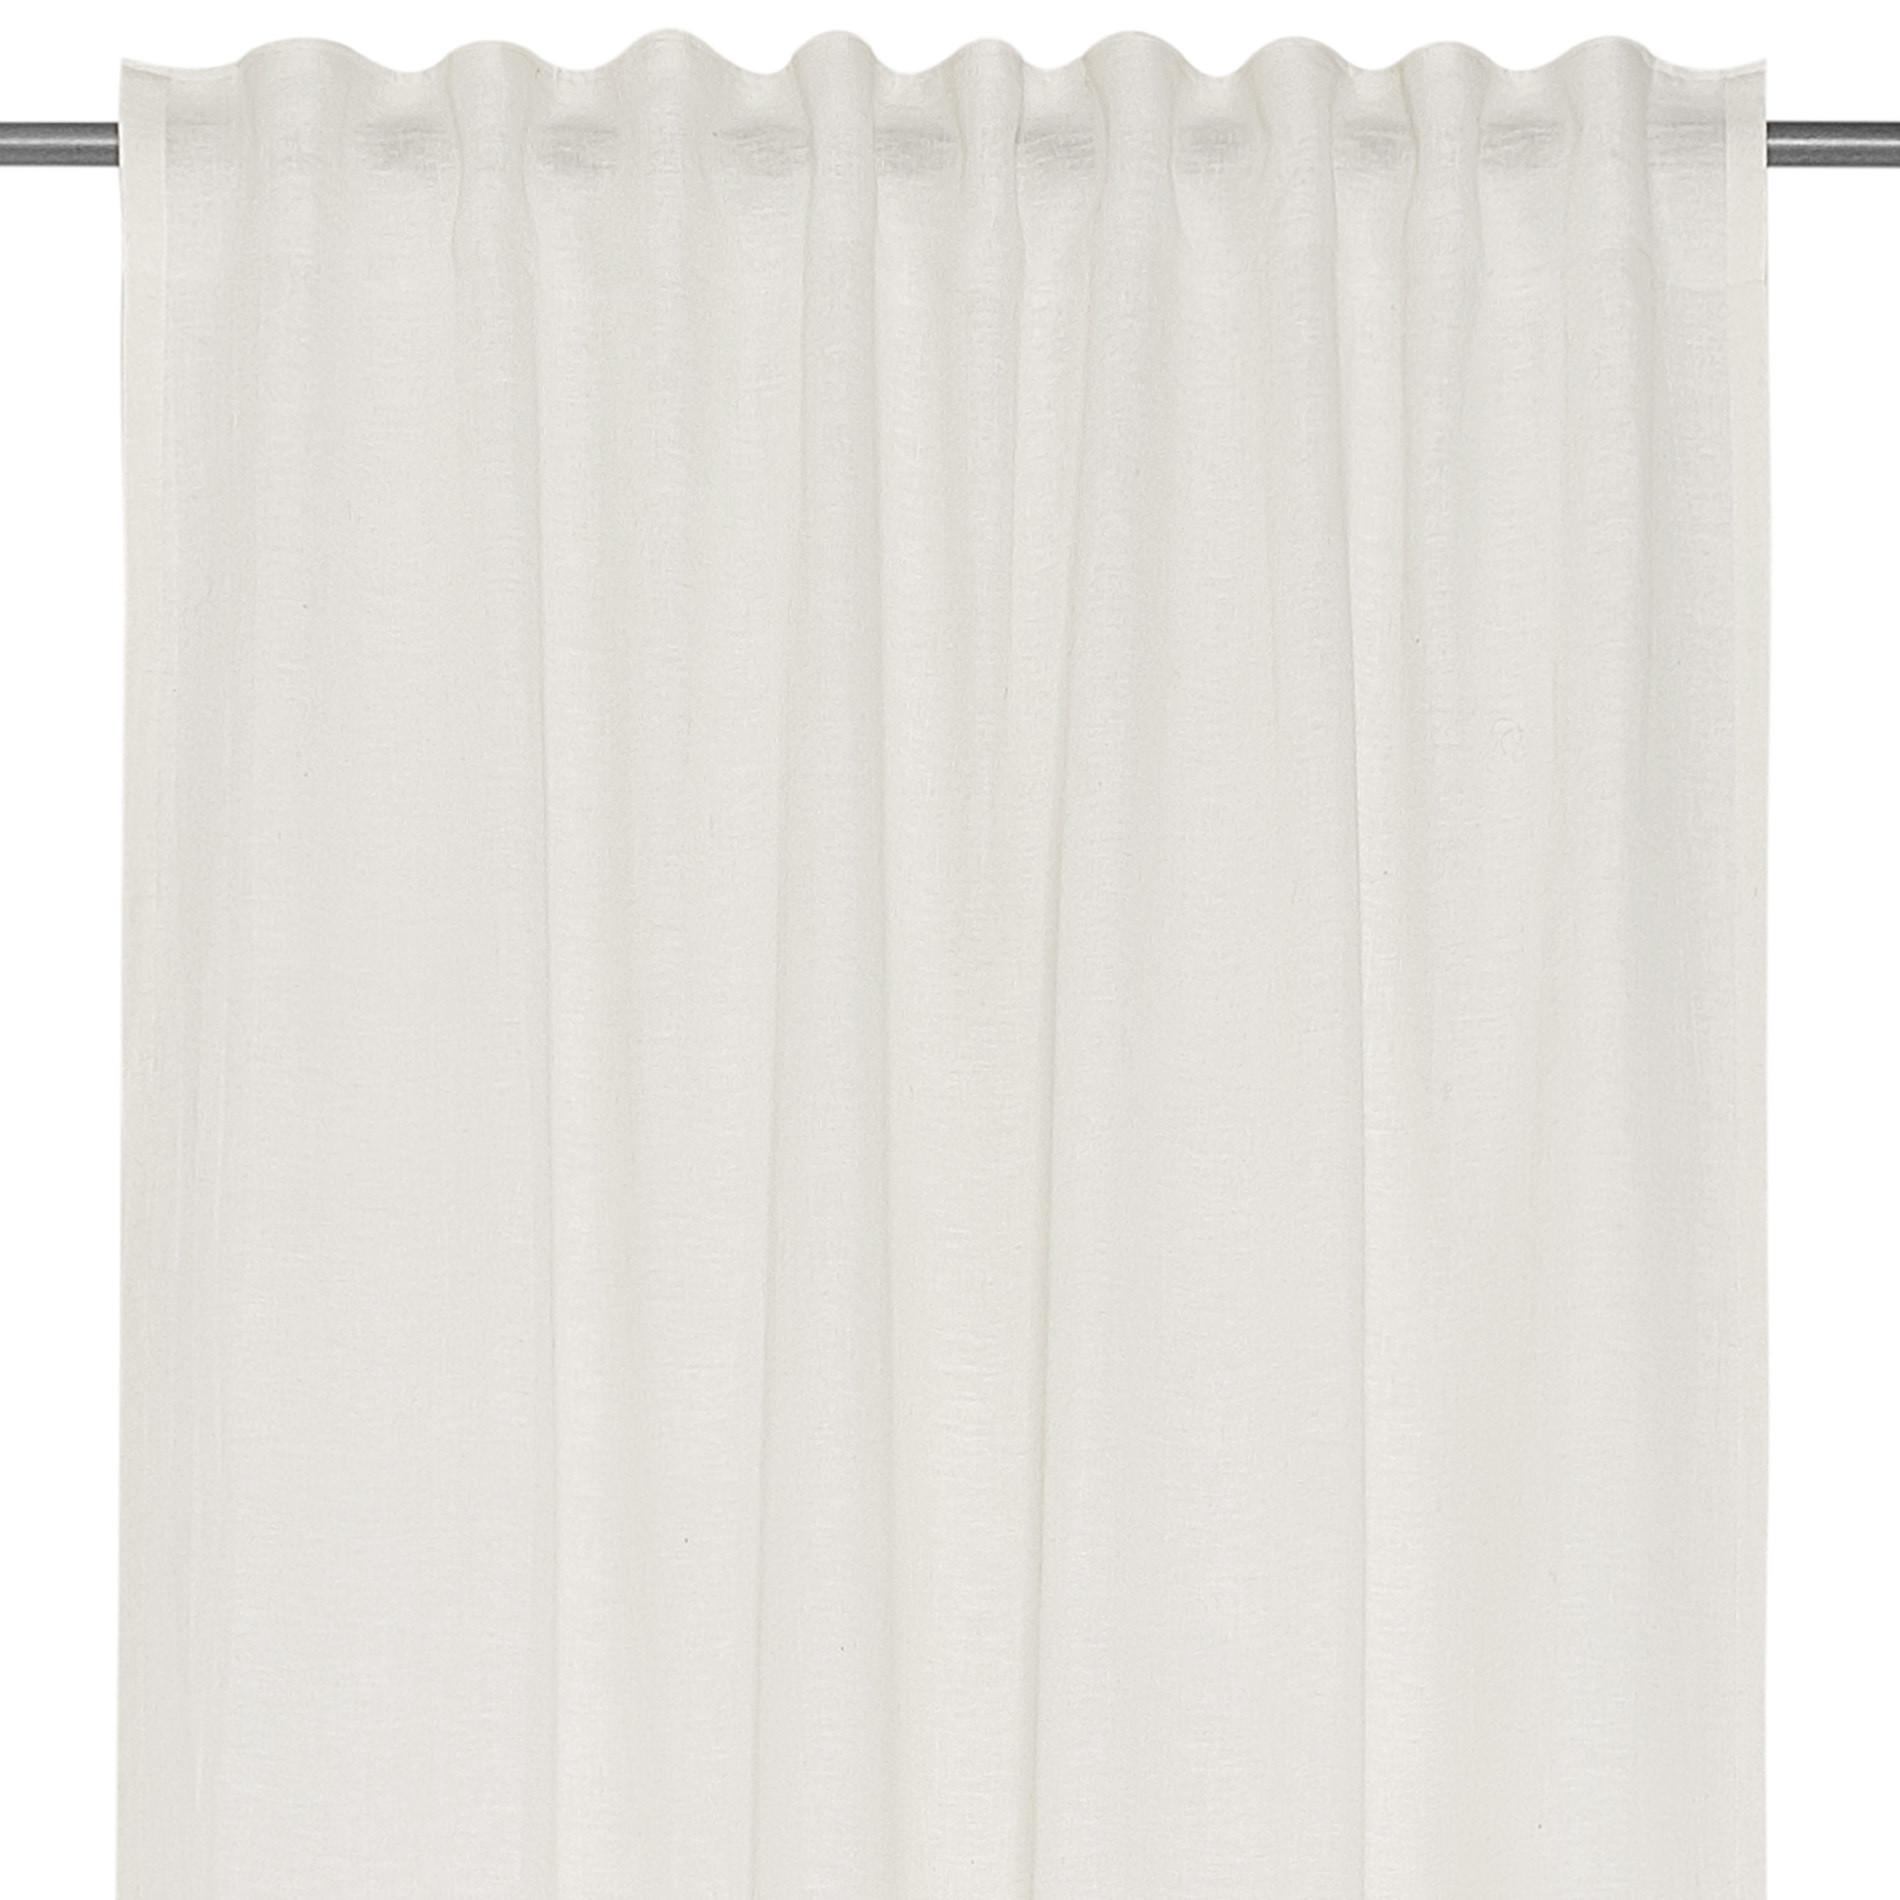 Tenda misto lino con passanti nascosti, Bianco, large image number 3